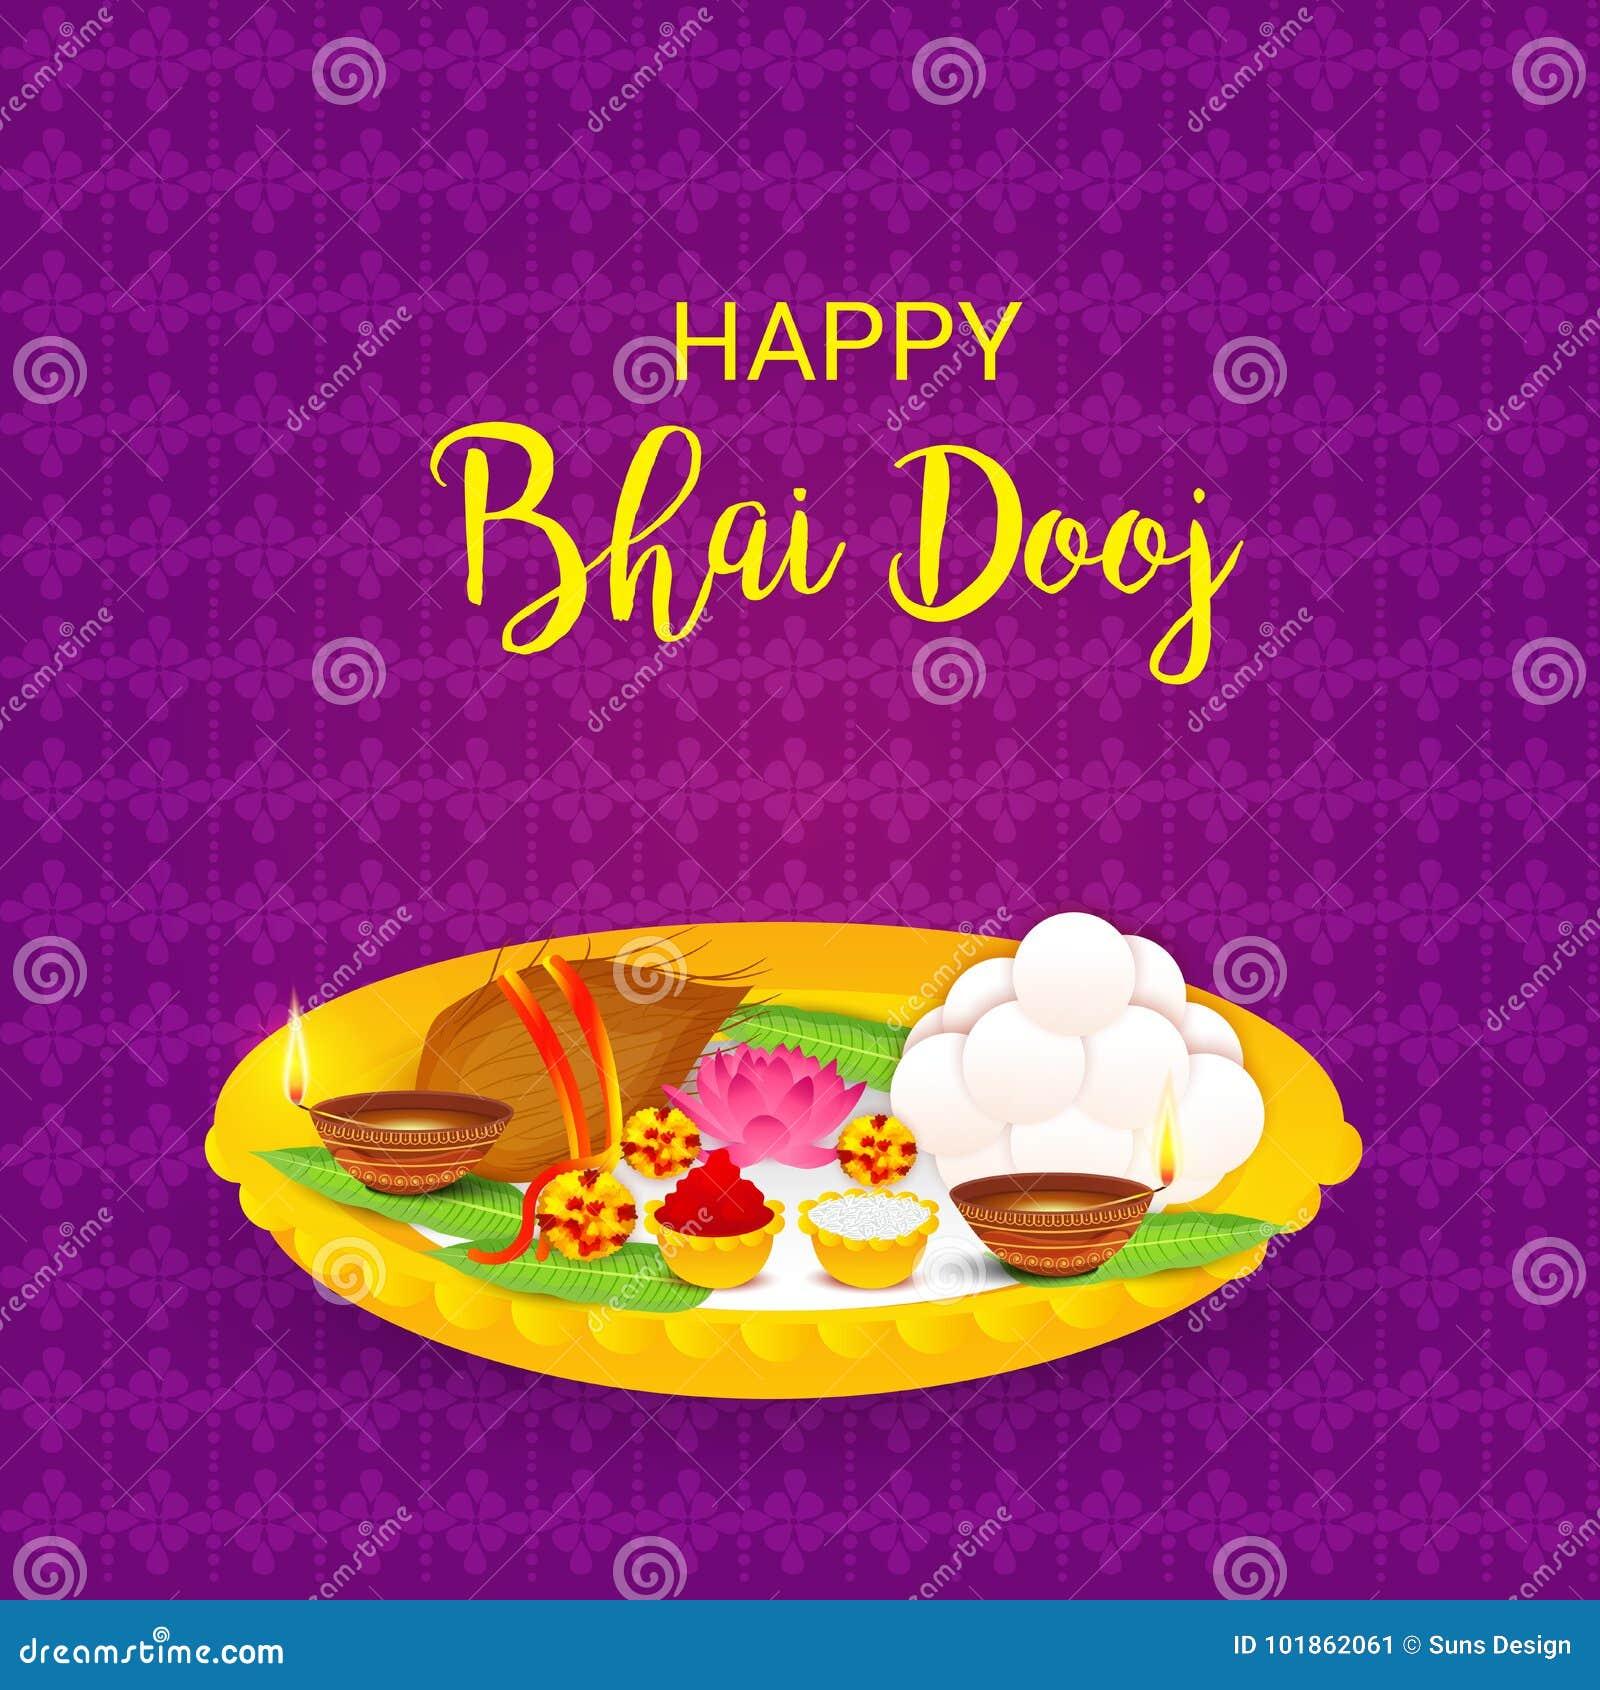 Happy bhai dooj stock illustration illustration of indian 101862061 download happy bhai dooj stock illustration illustration of indian 101862061 m4hsunfo